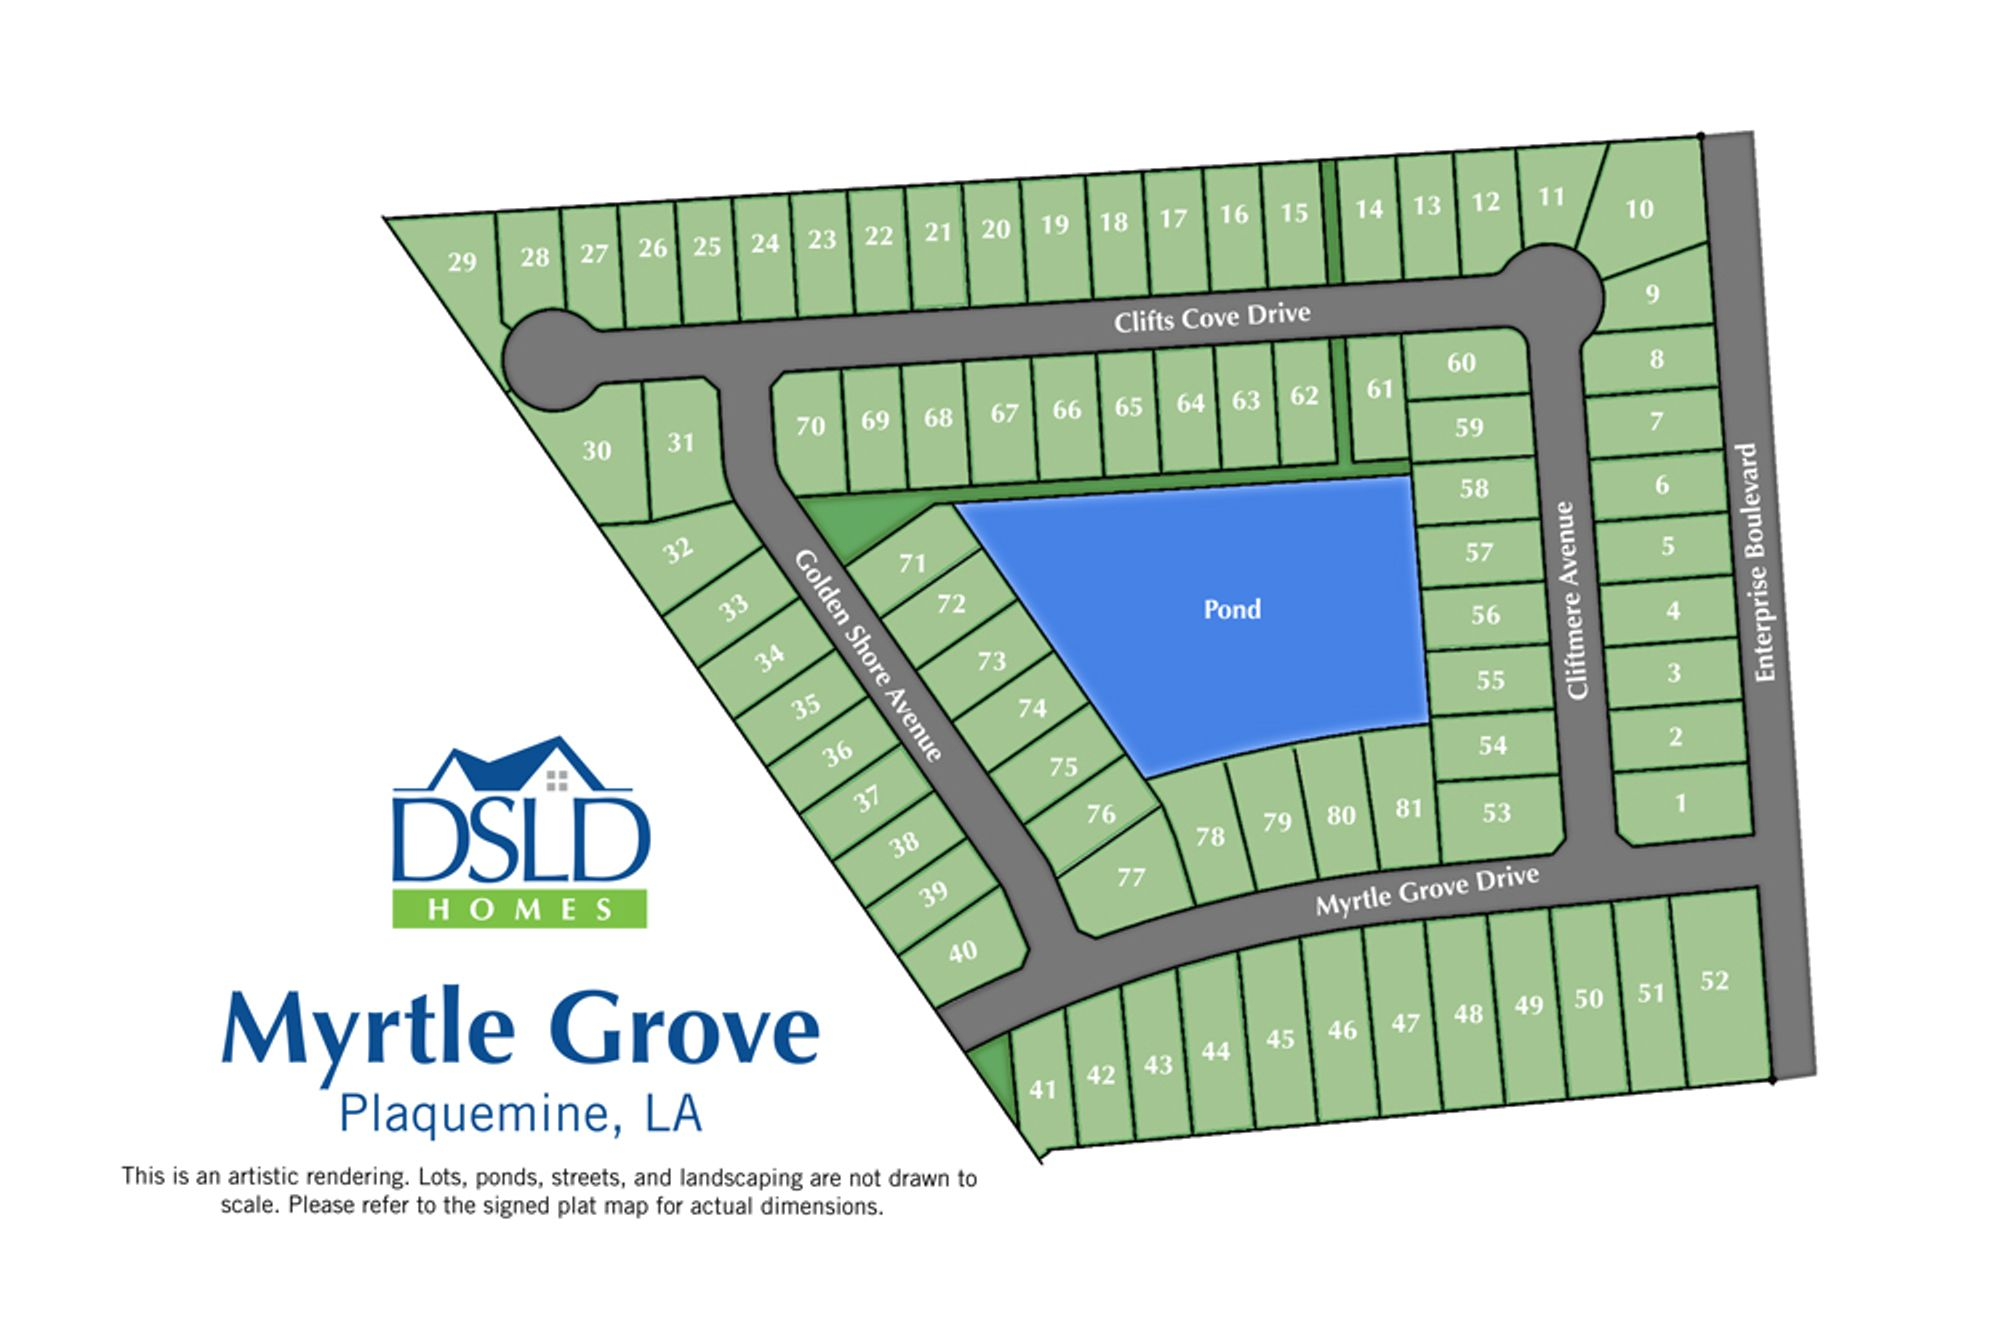 Myrtle Grove